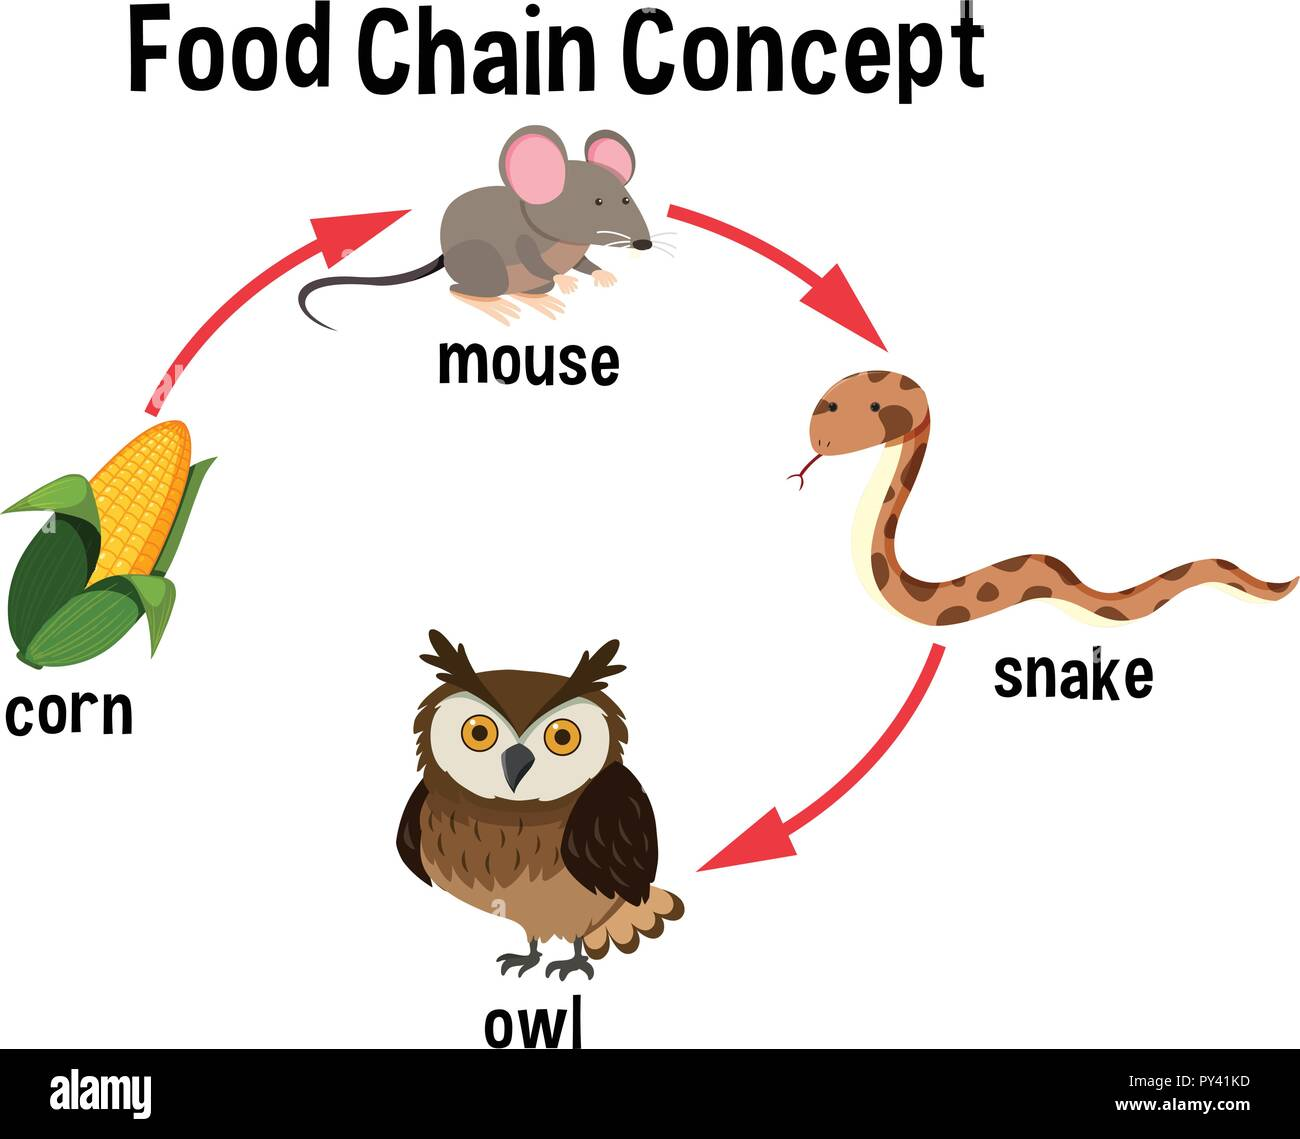 food chain concept diagram illustration stock vector artfood chain concept diagram illustration